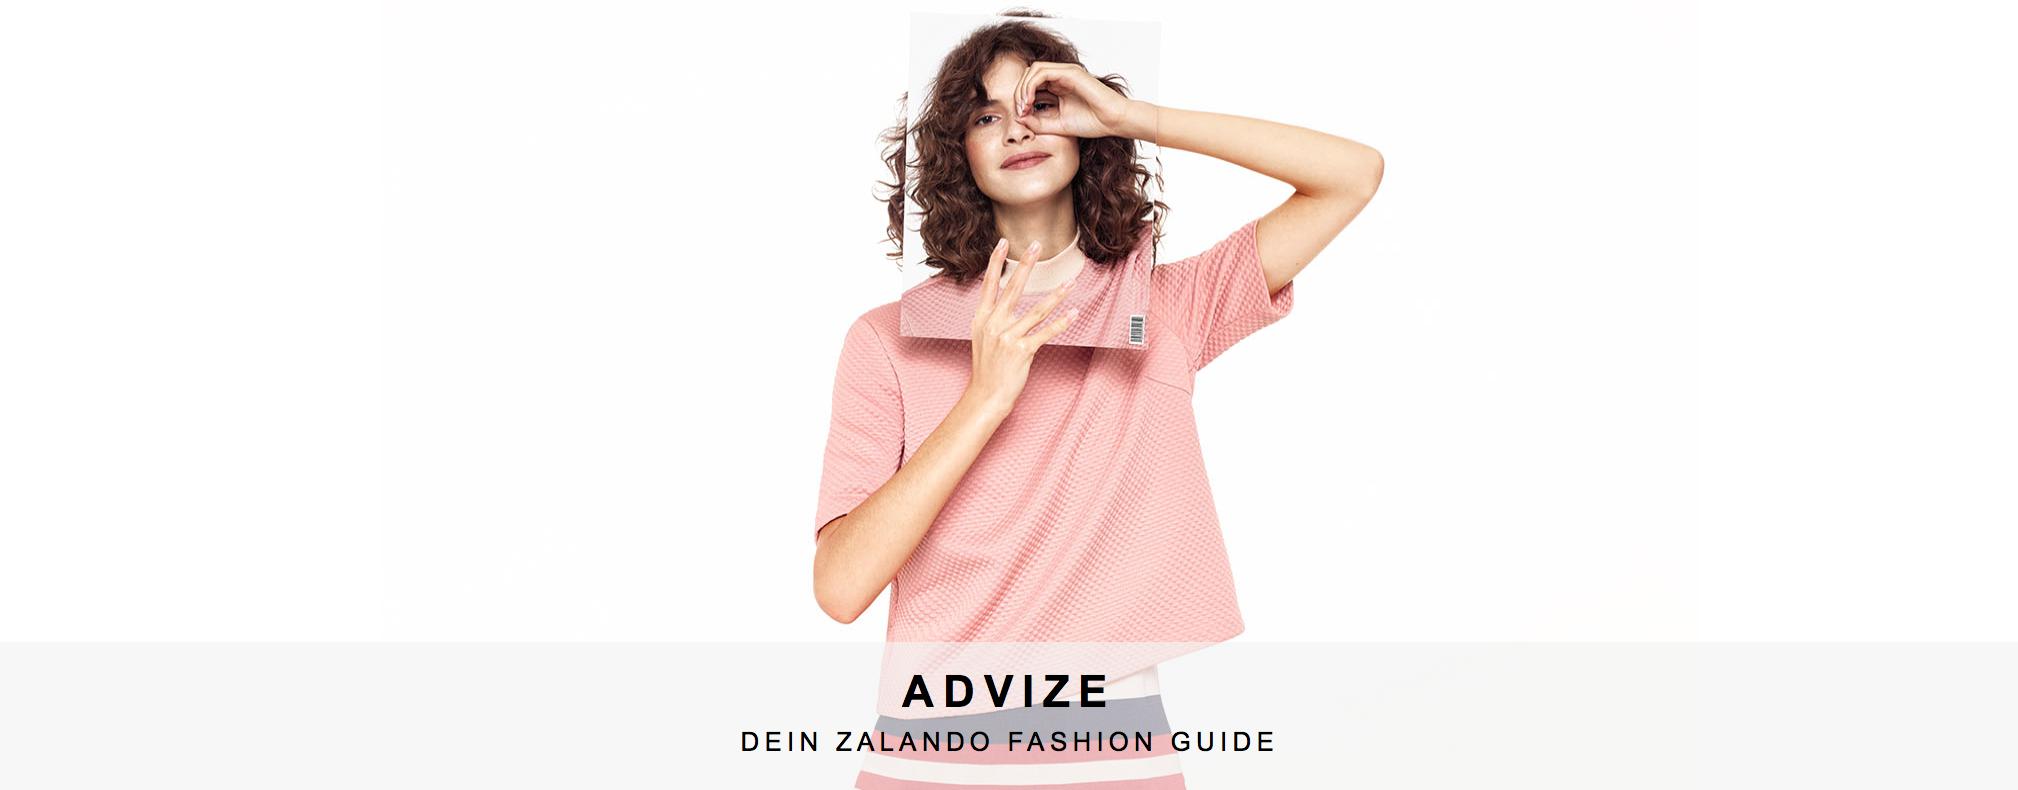 ADVIZE by Zalando